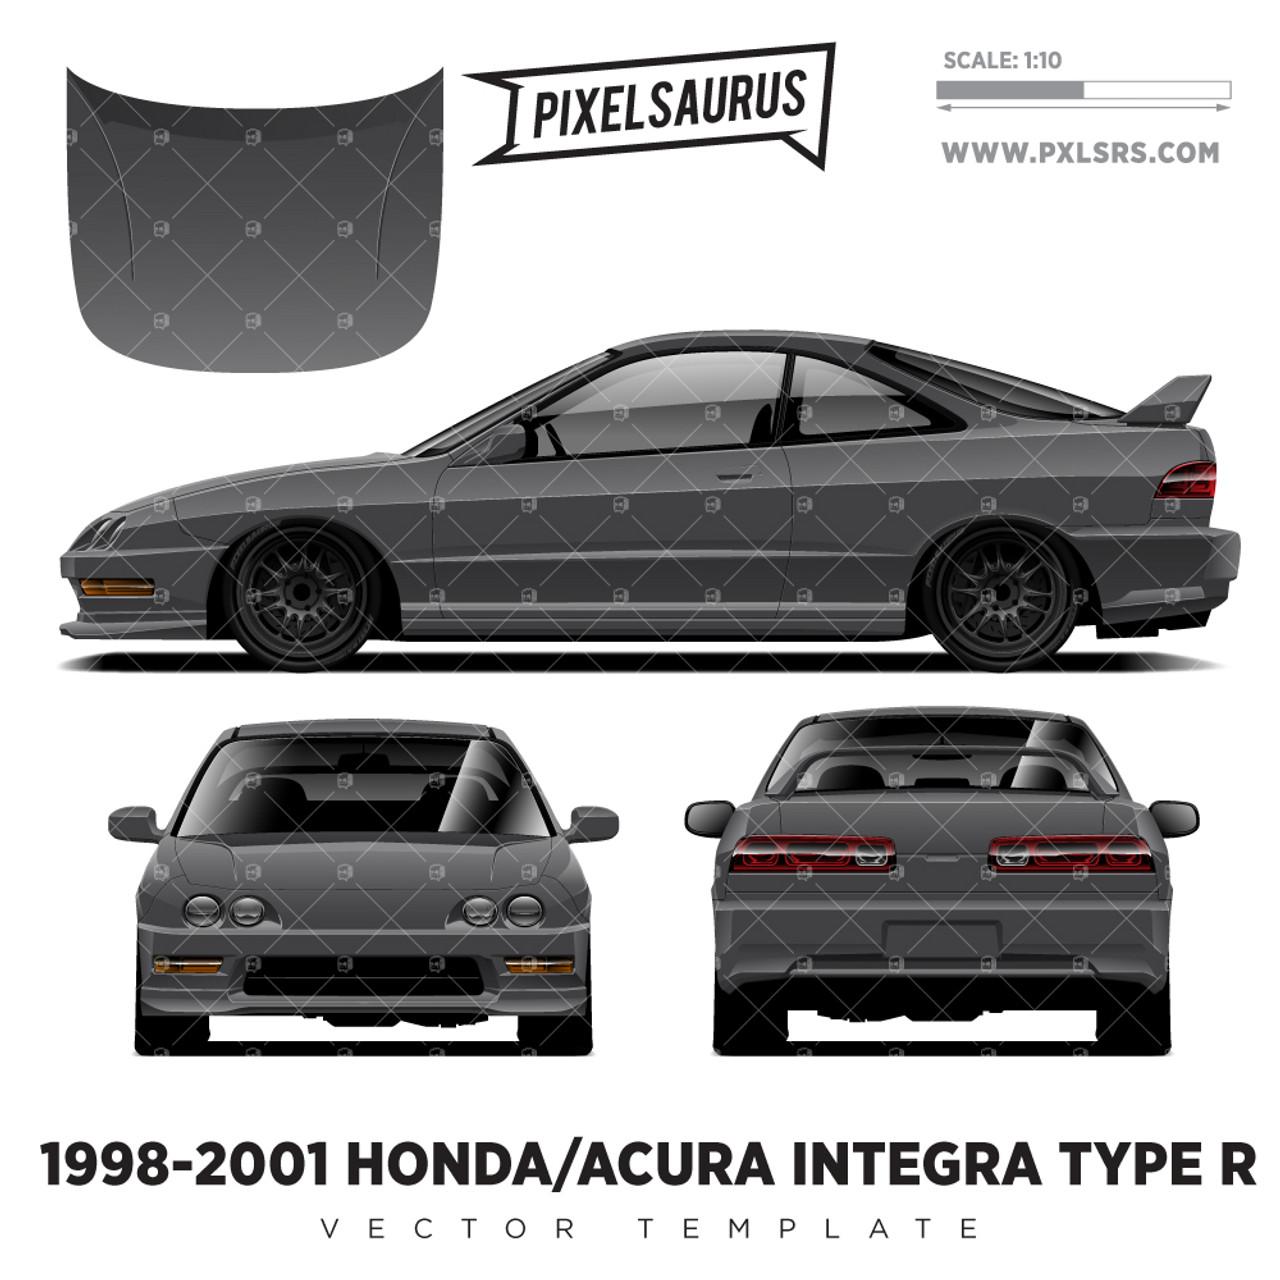 1998 2001 Honda Acura Integra Type R Vector Template Pixelsaurus